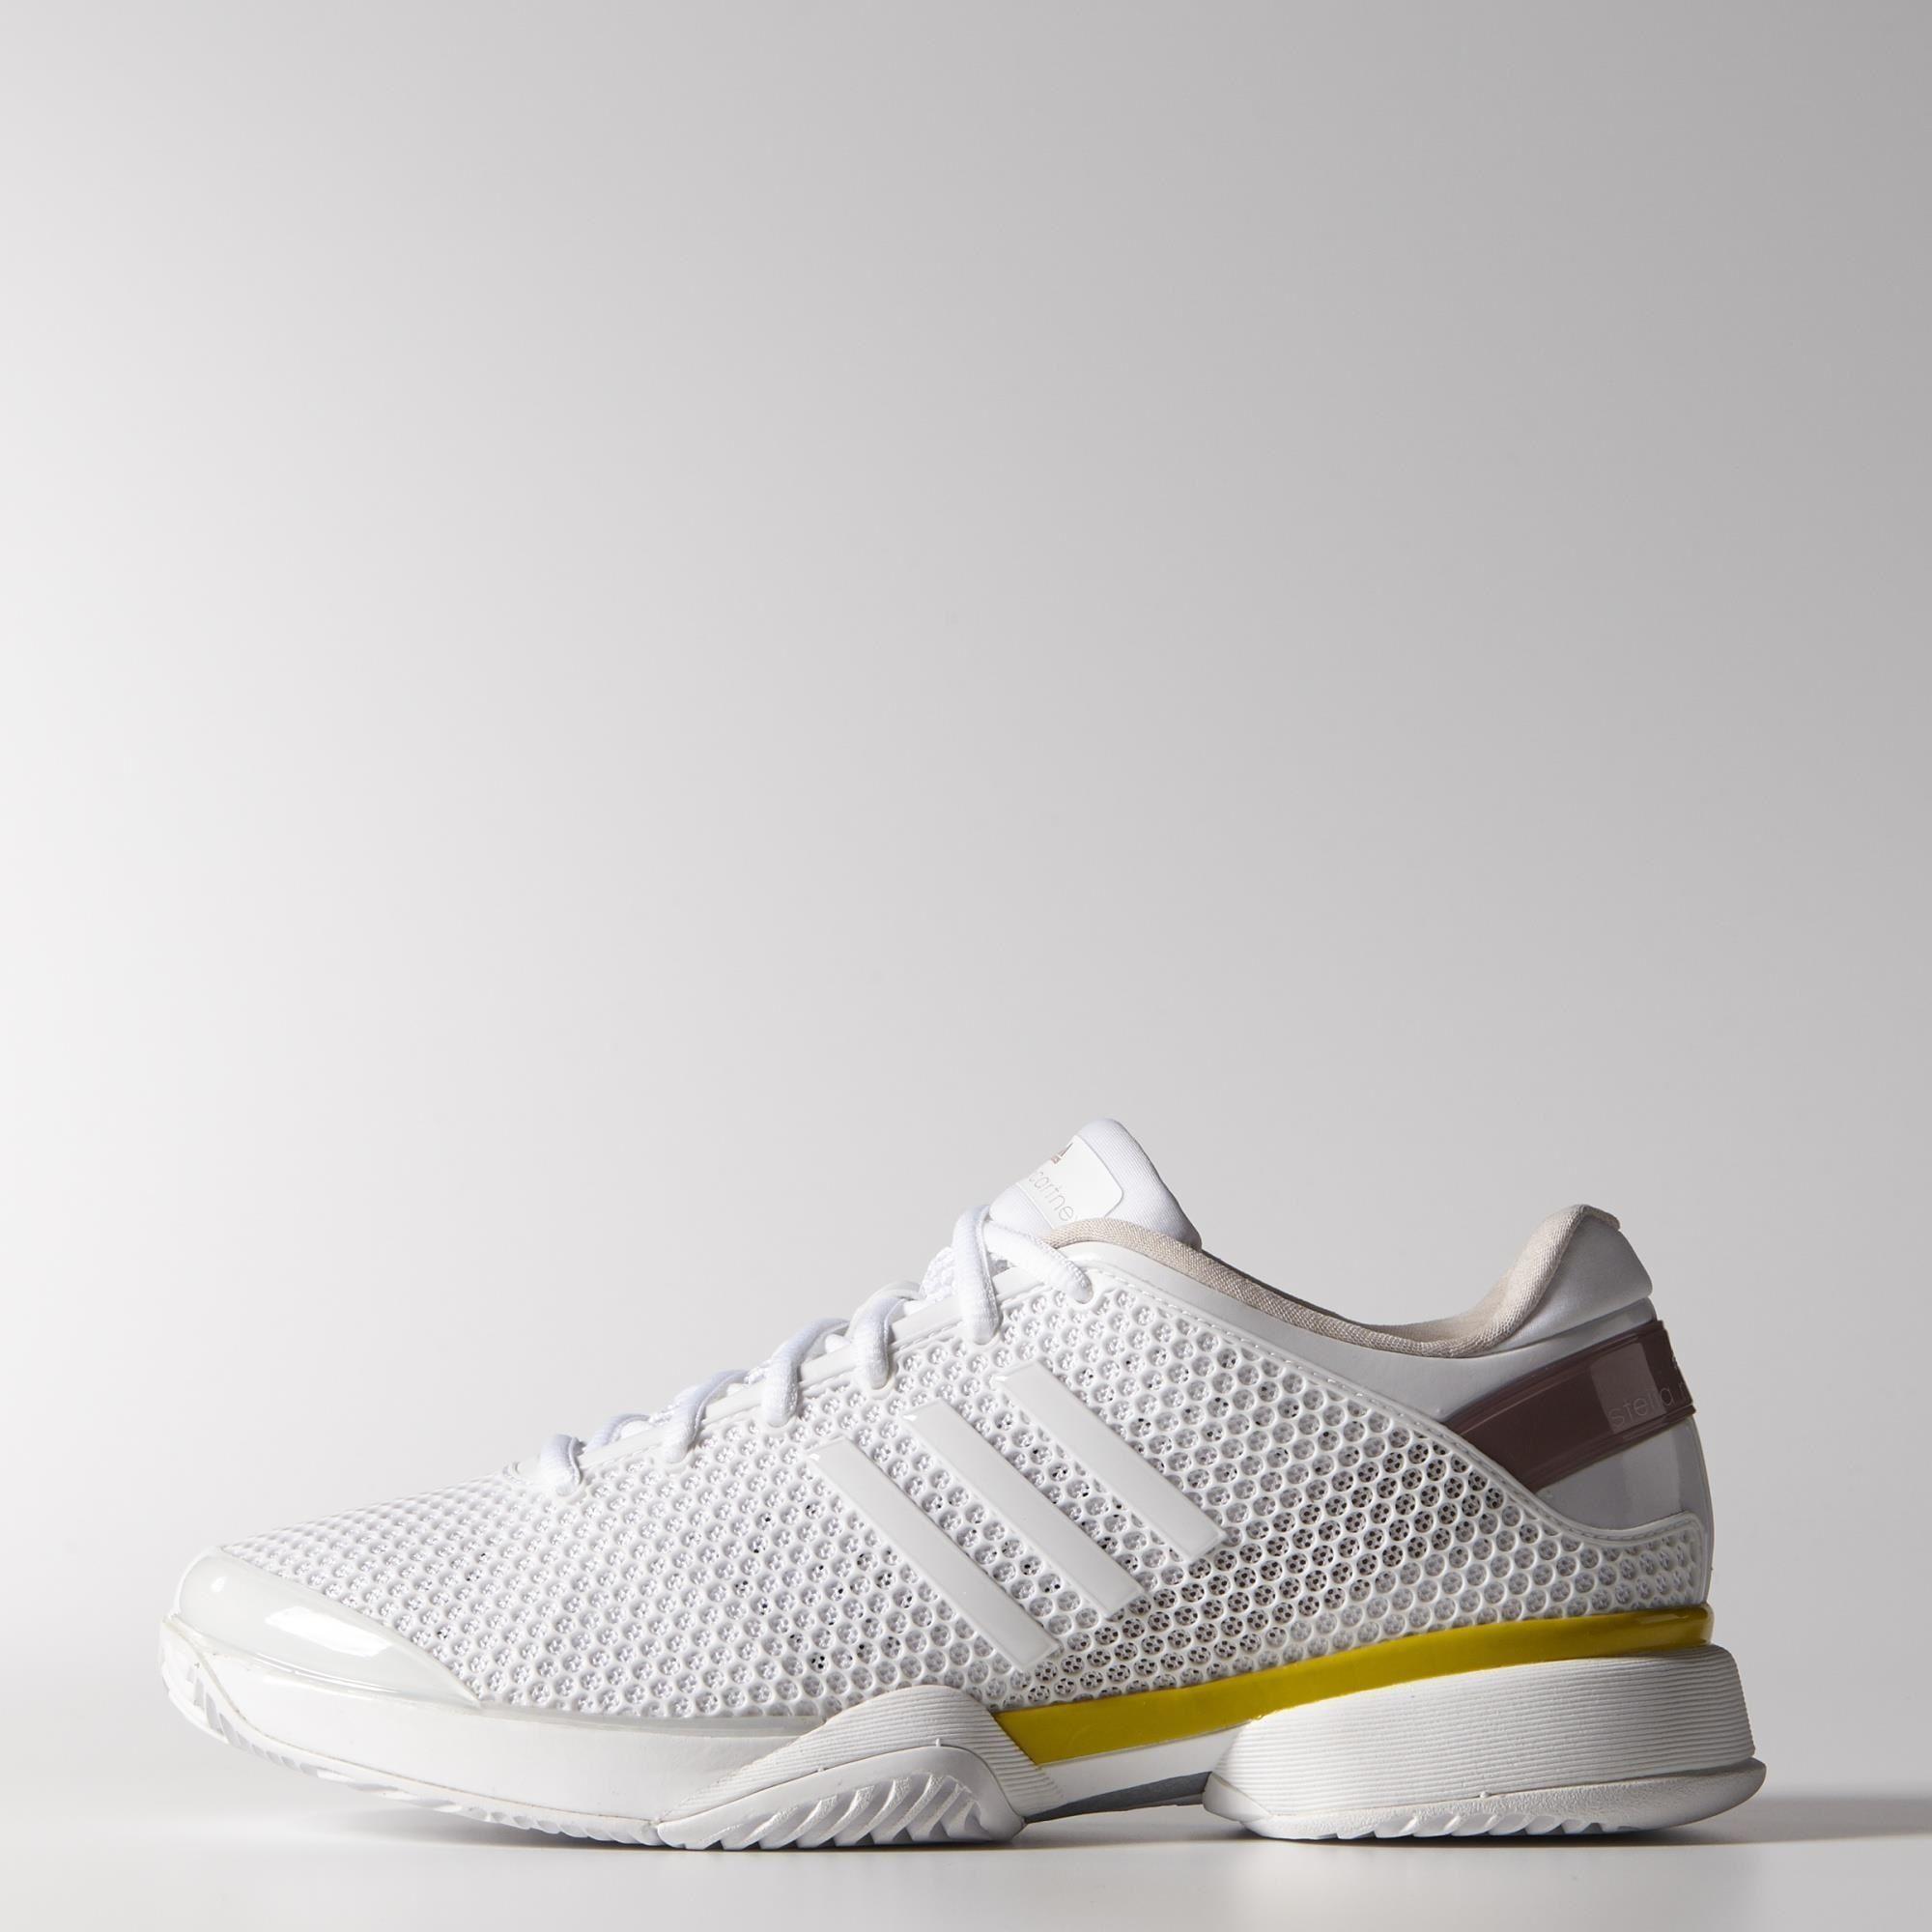 new style 9ab12 2ad96 adidas - Womens adidas by Stella McCartney Barricade Shoes